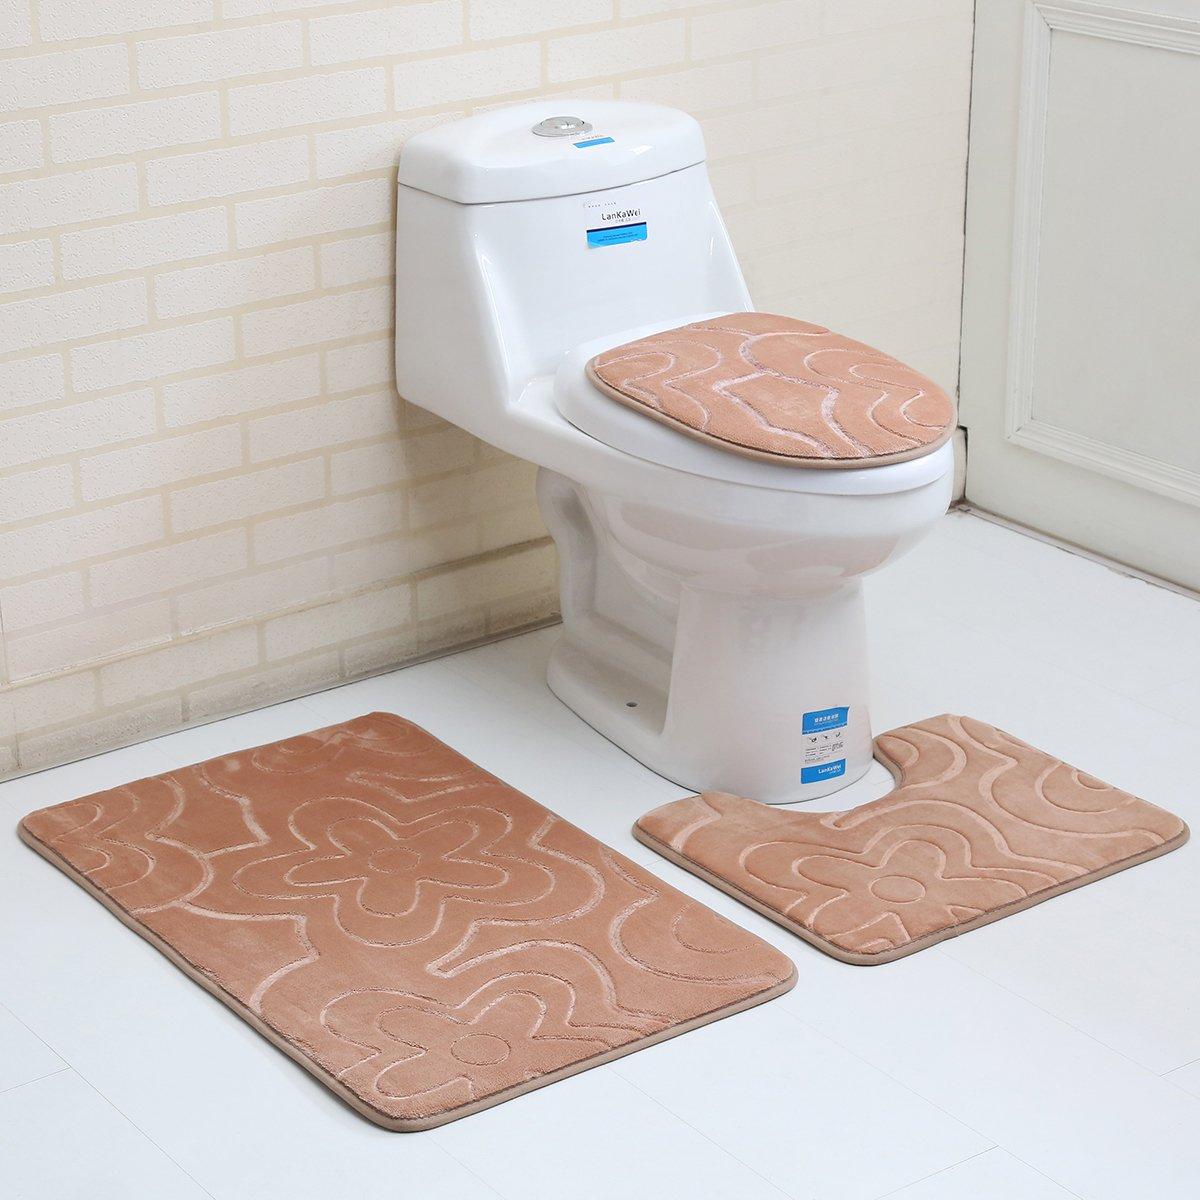 "3PC Bath Mat Rug Set Bathroom Non-Slip Floor Mat Flannel Pedestal Rug(15.7""x19.7"") + Lid Toilet Cover(15.7""x17.7"") + Bath Mat Makaor (19.7""x31.4"") (Light coffee)"